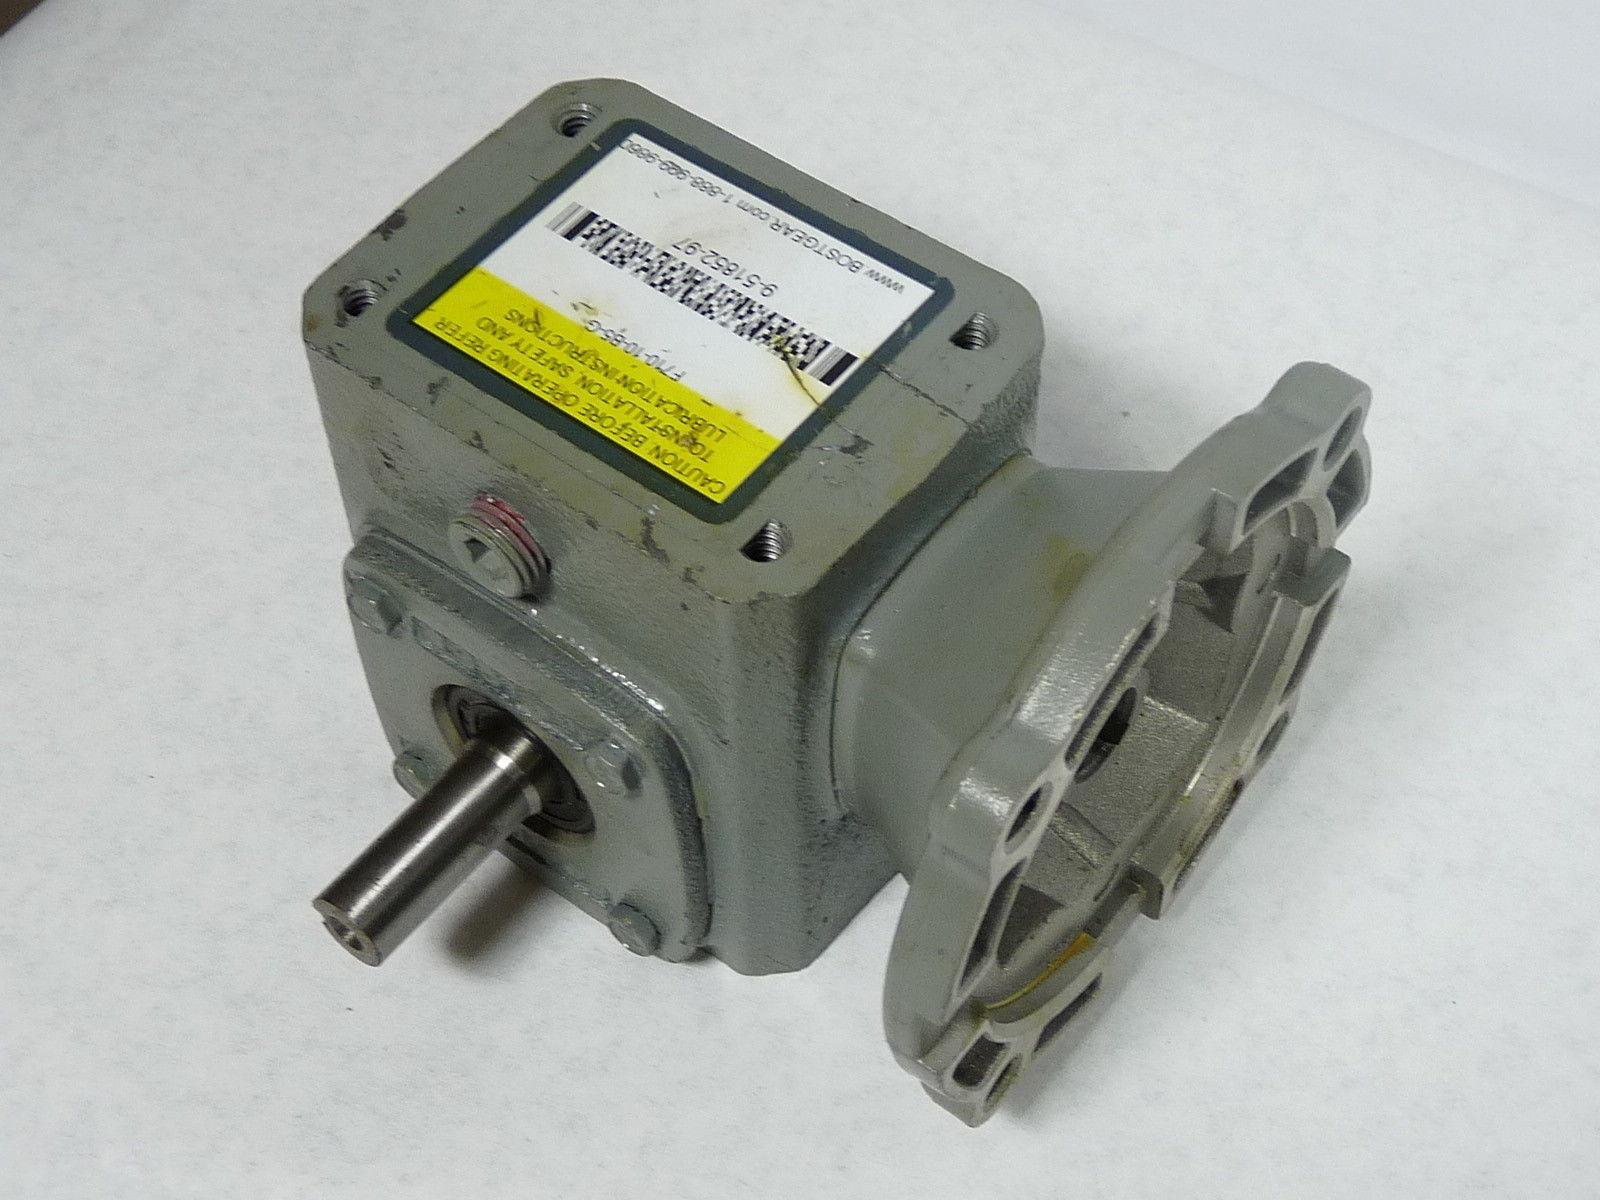 Boston engranaje reductor de engranajes RFB F710-10-B4-6 0.37HP 123lb-In 10:1 RFB engranajes 3e0c09